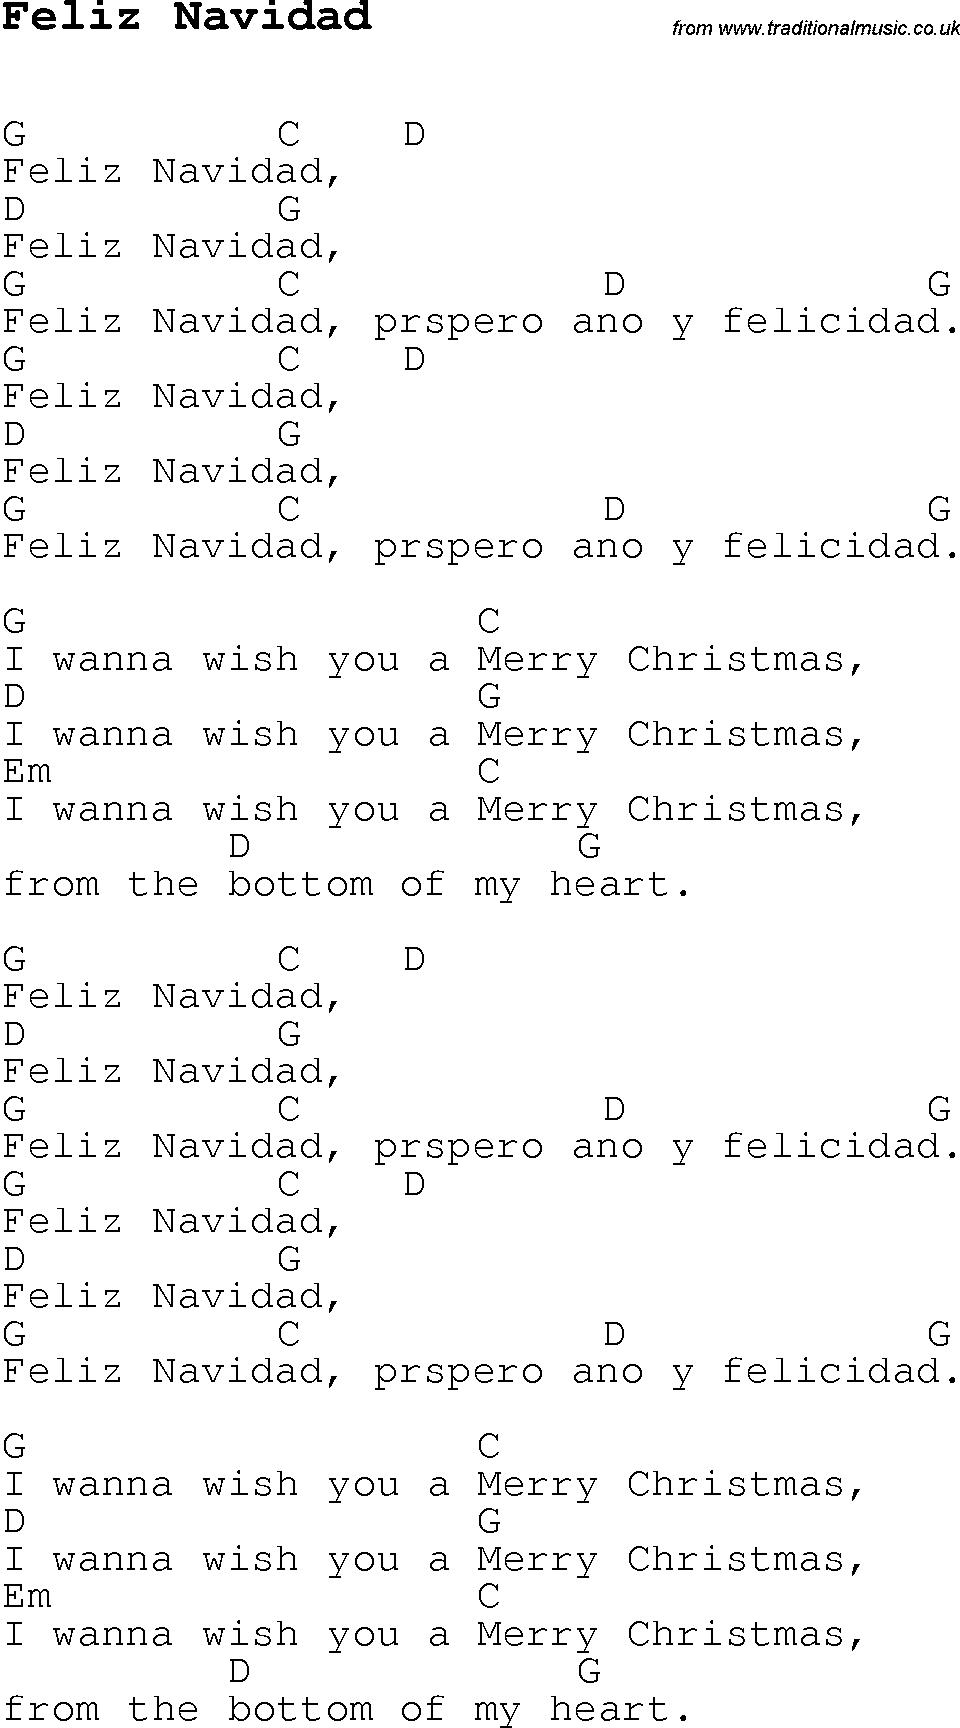 Feliz Navidad Chords Christmas Carolsong Lyrics With Chords For Feliz Navidad